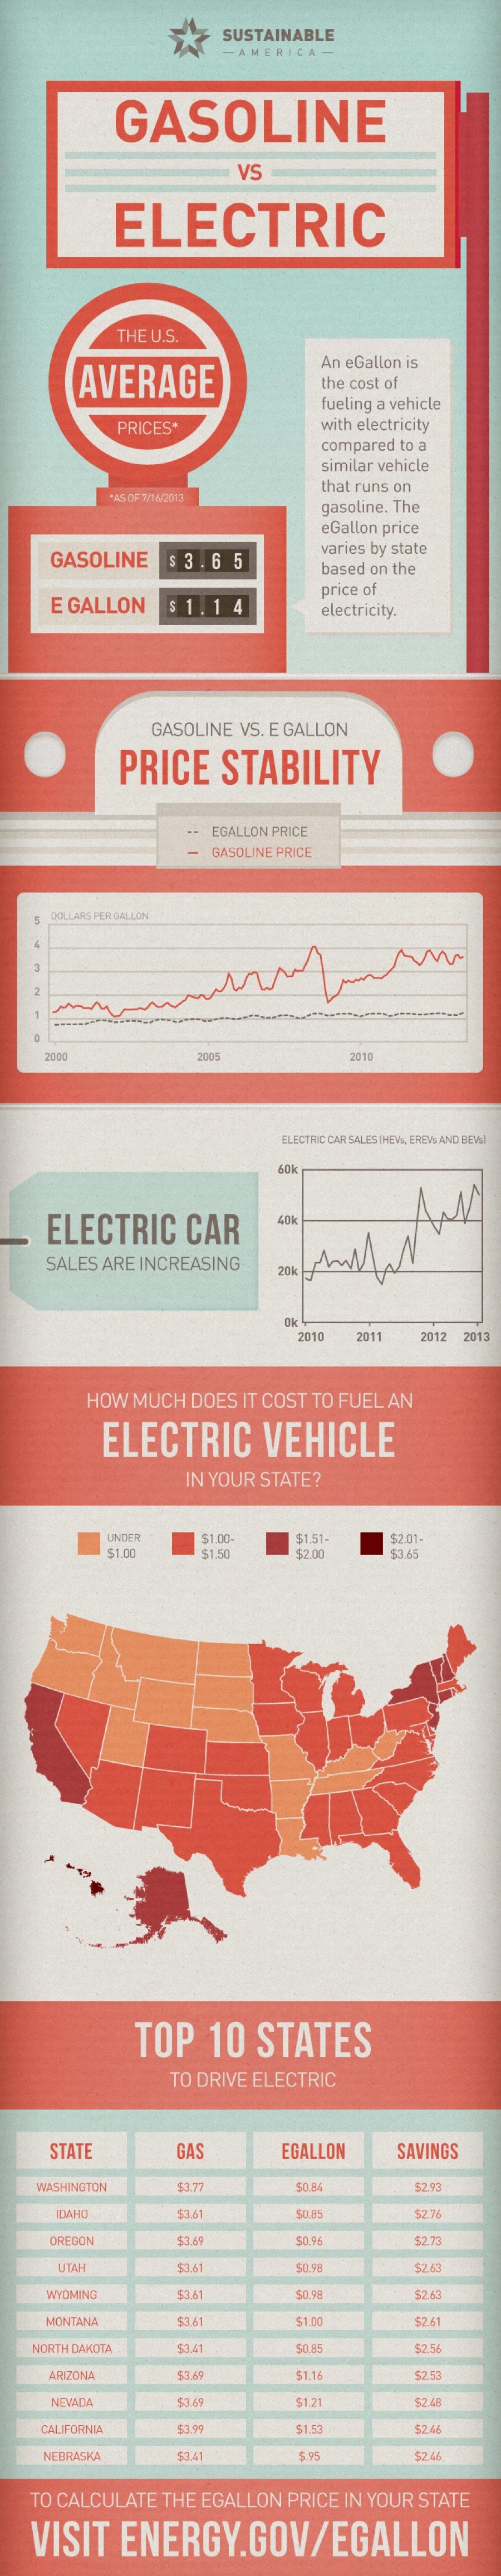 gasoline-vs-electric_5255a825b8a34